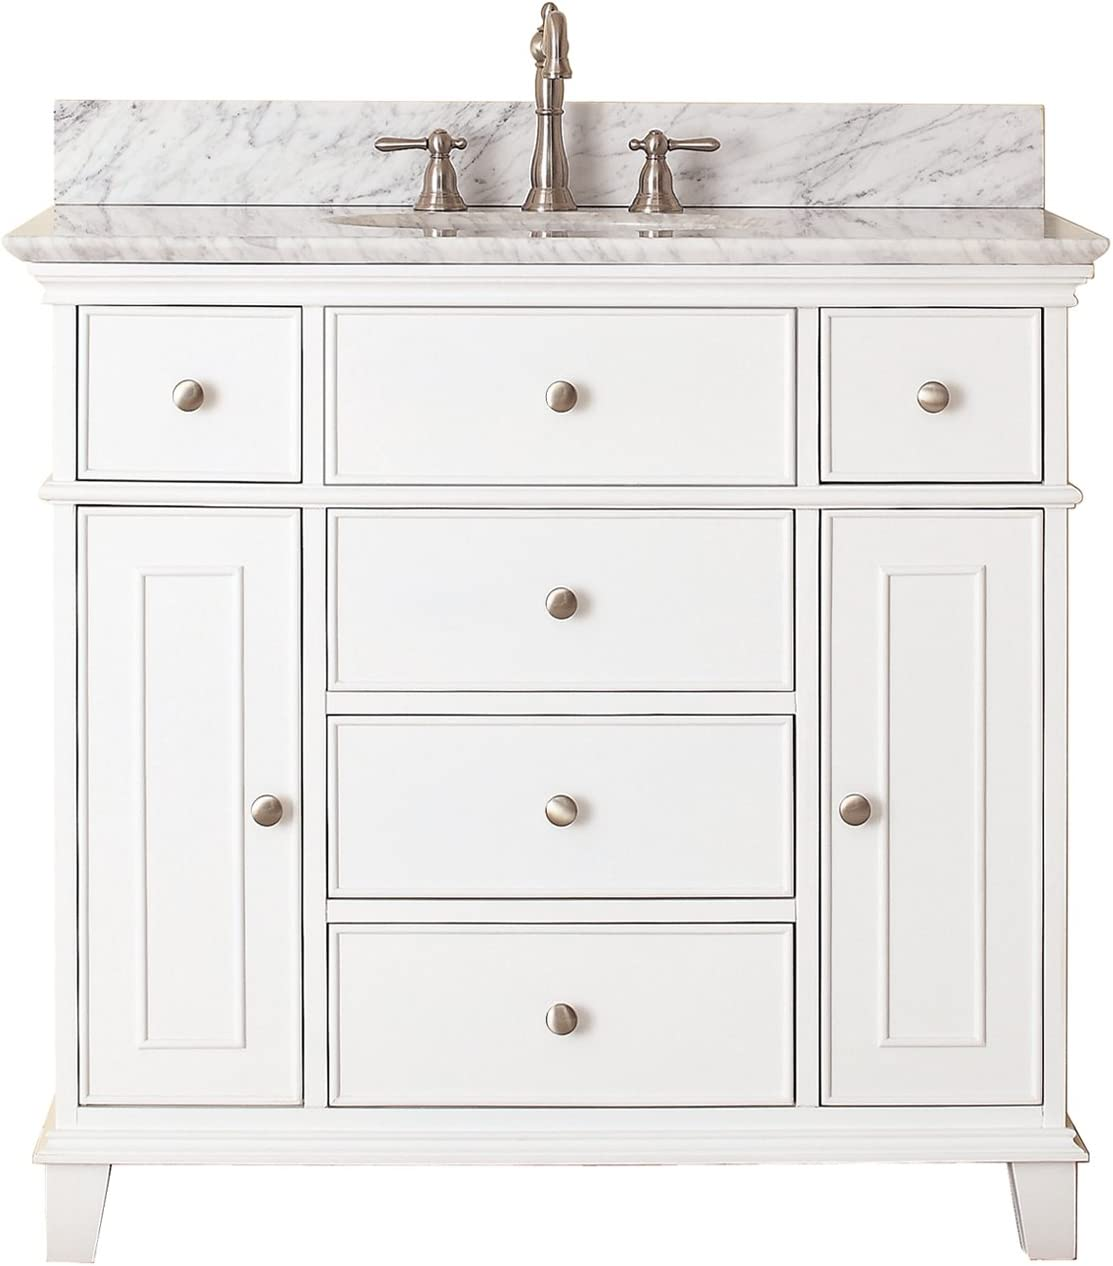 Avanity Windsor 36 In Vanity With Carrera White Marble Top And Undermount Sink In White Finish Bathroom Vanities Amazon Com